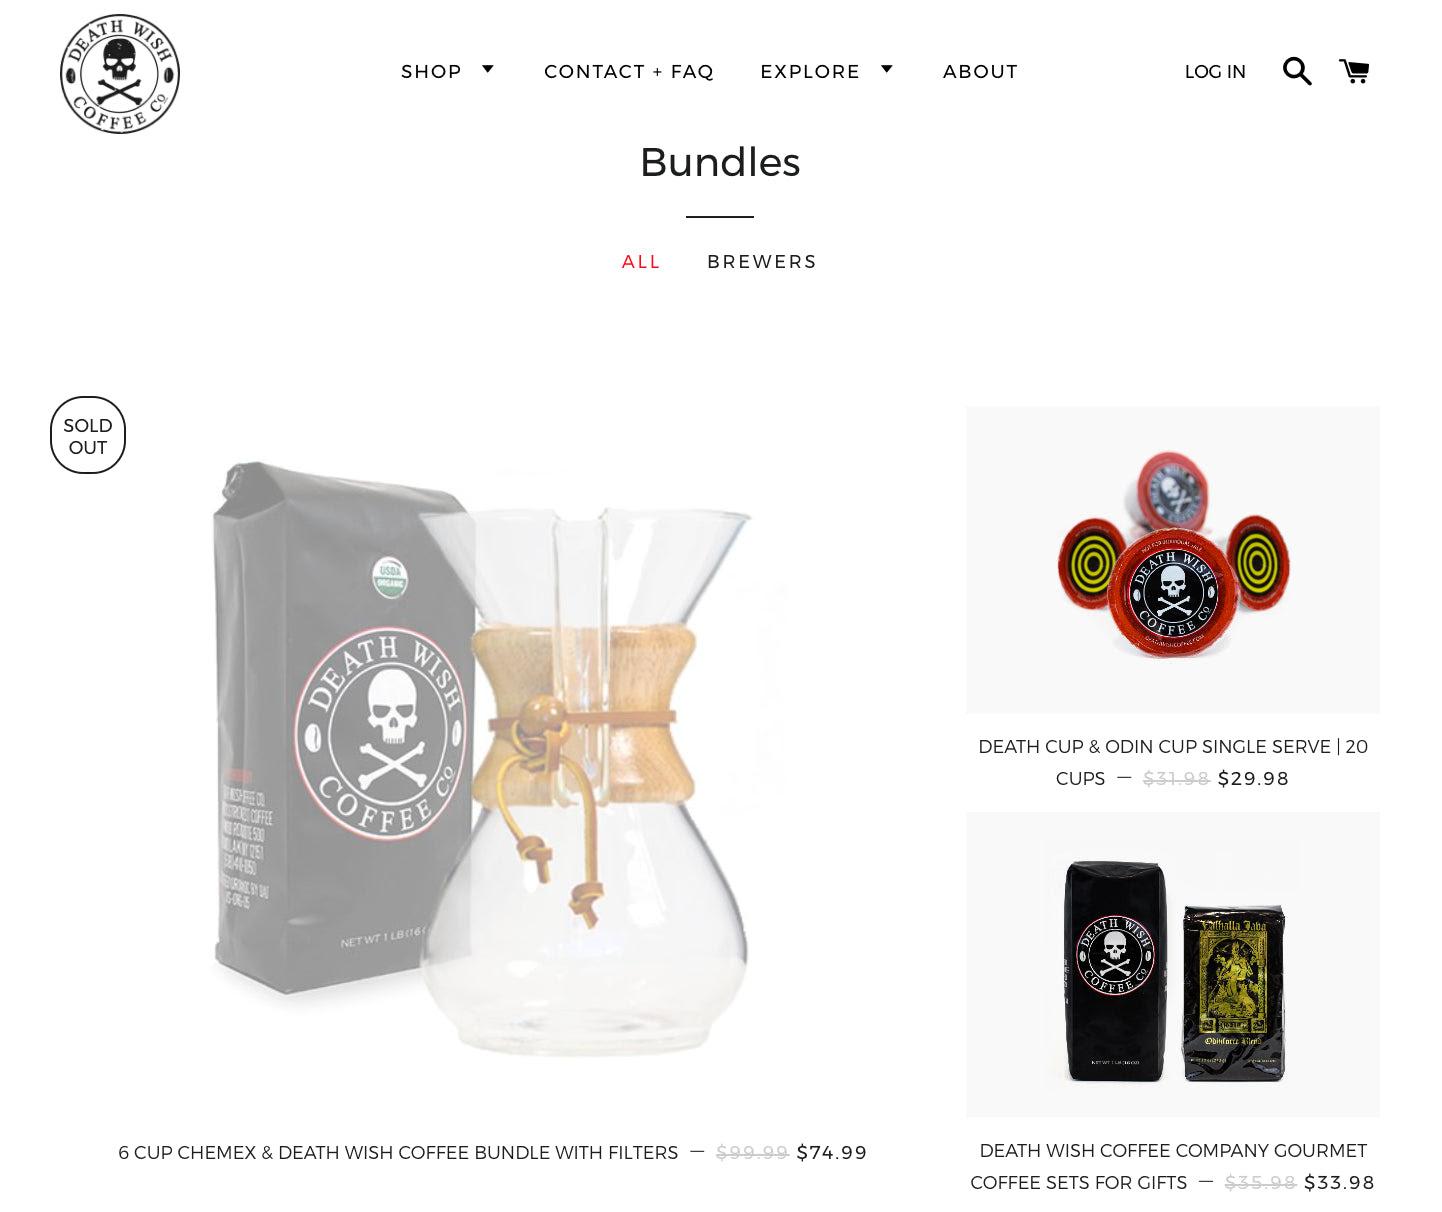 Death Wish Coffee bundle